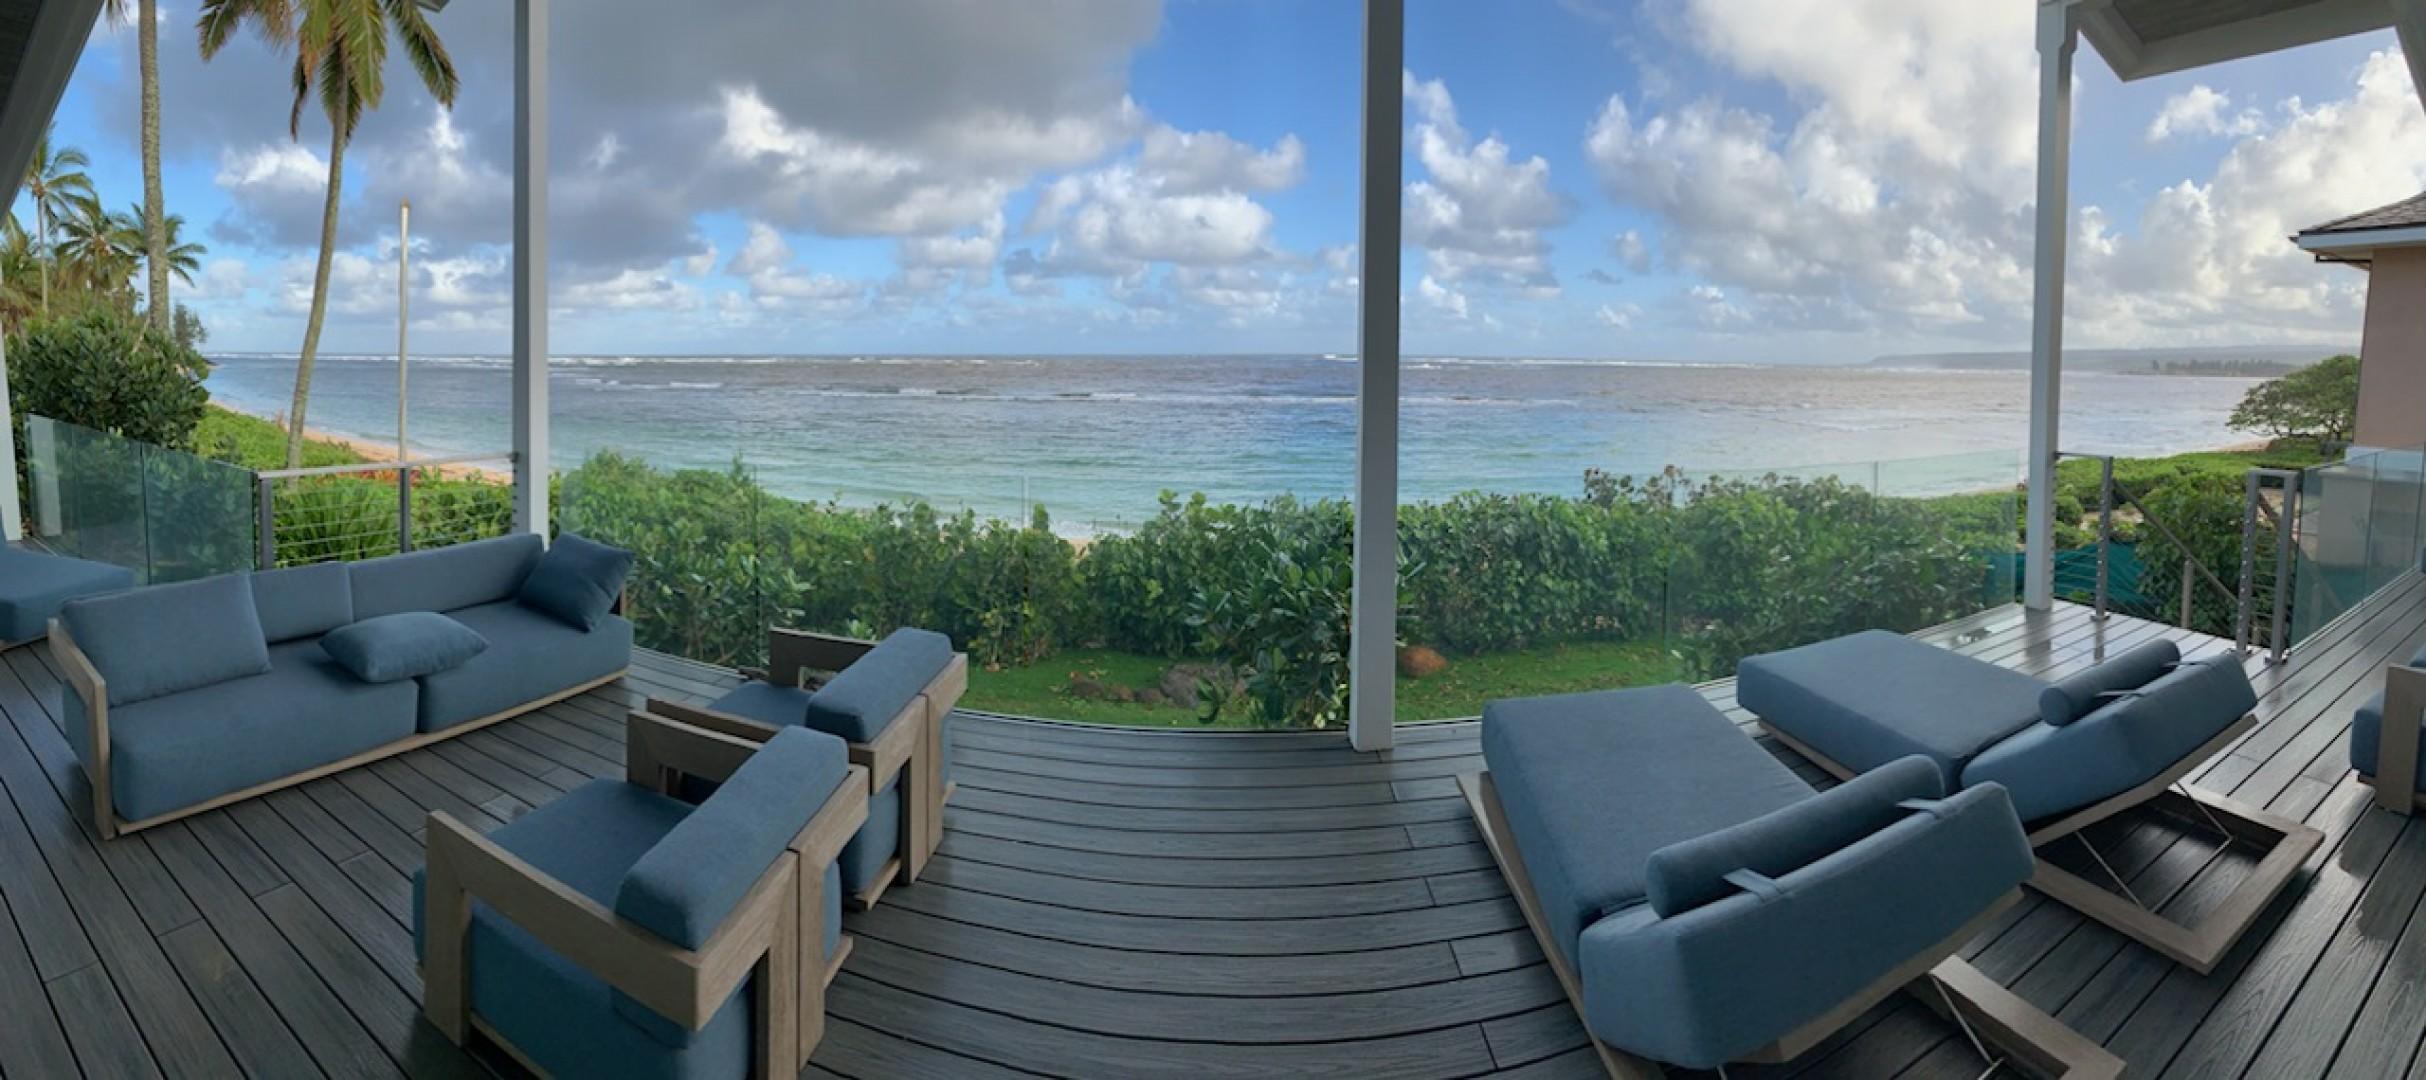 Oceanfront lanai panoramic